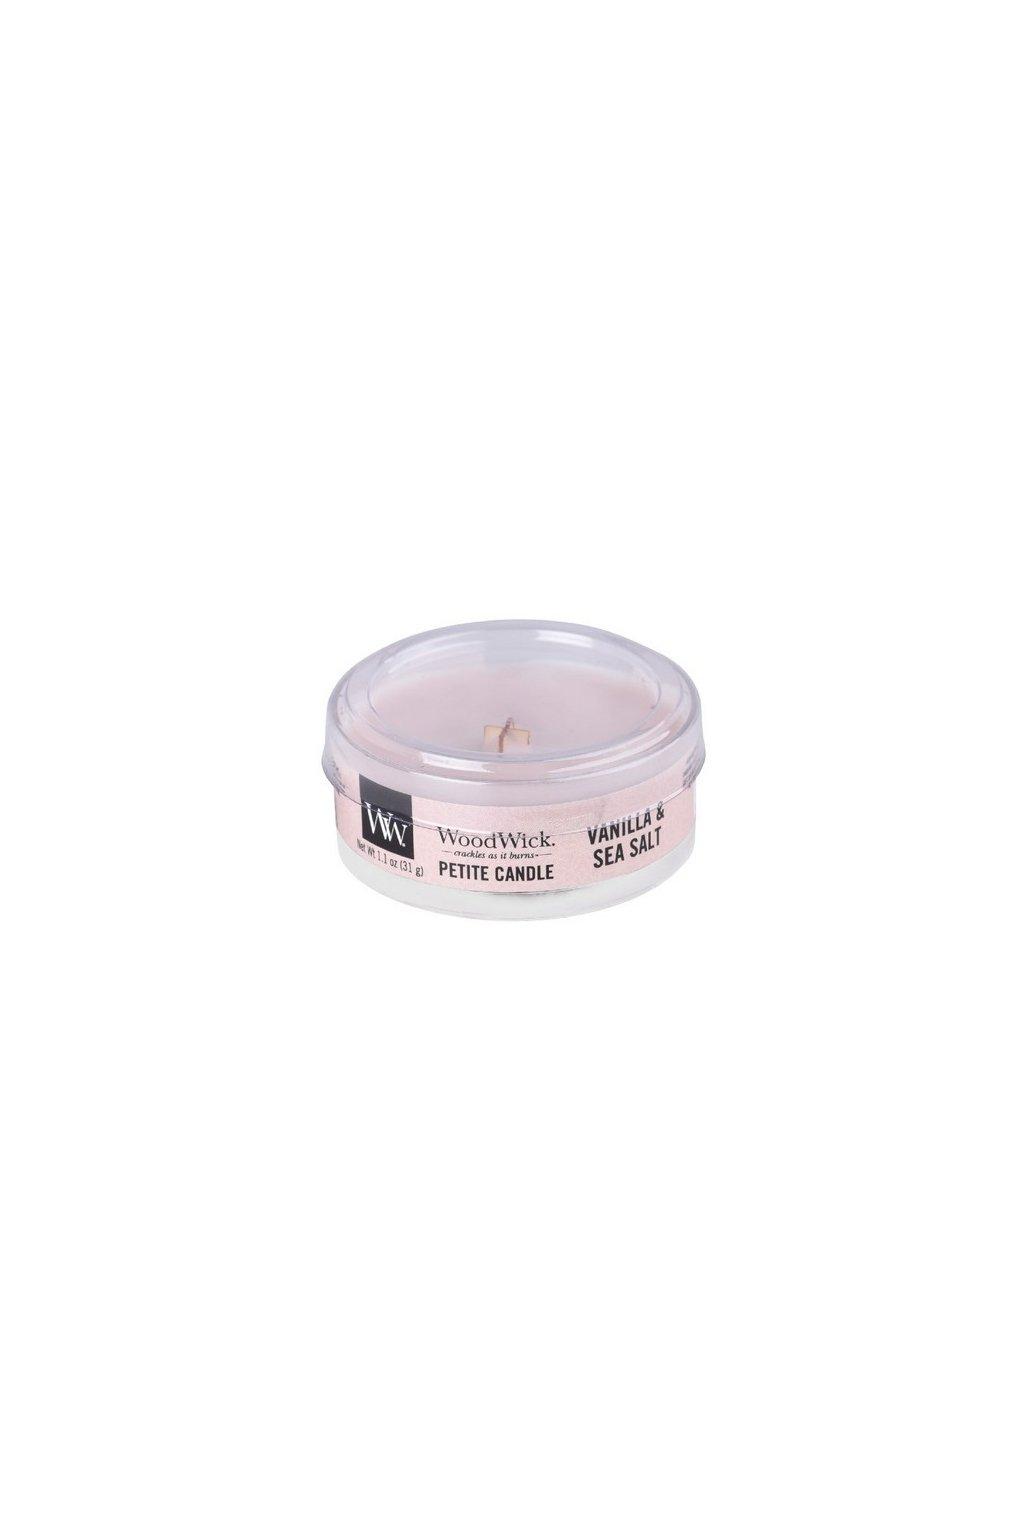 Woodwick Sea Salt & Vanilla svíčka petite